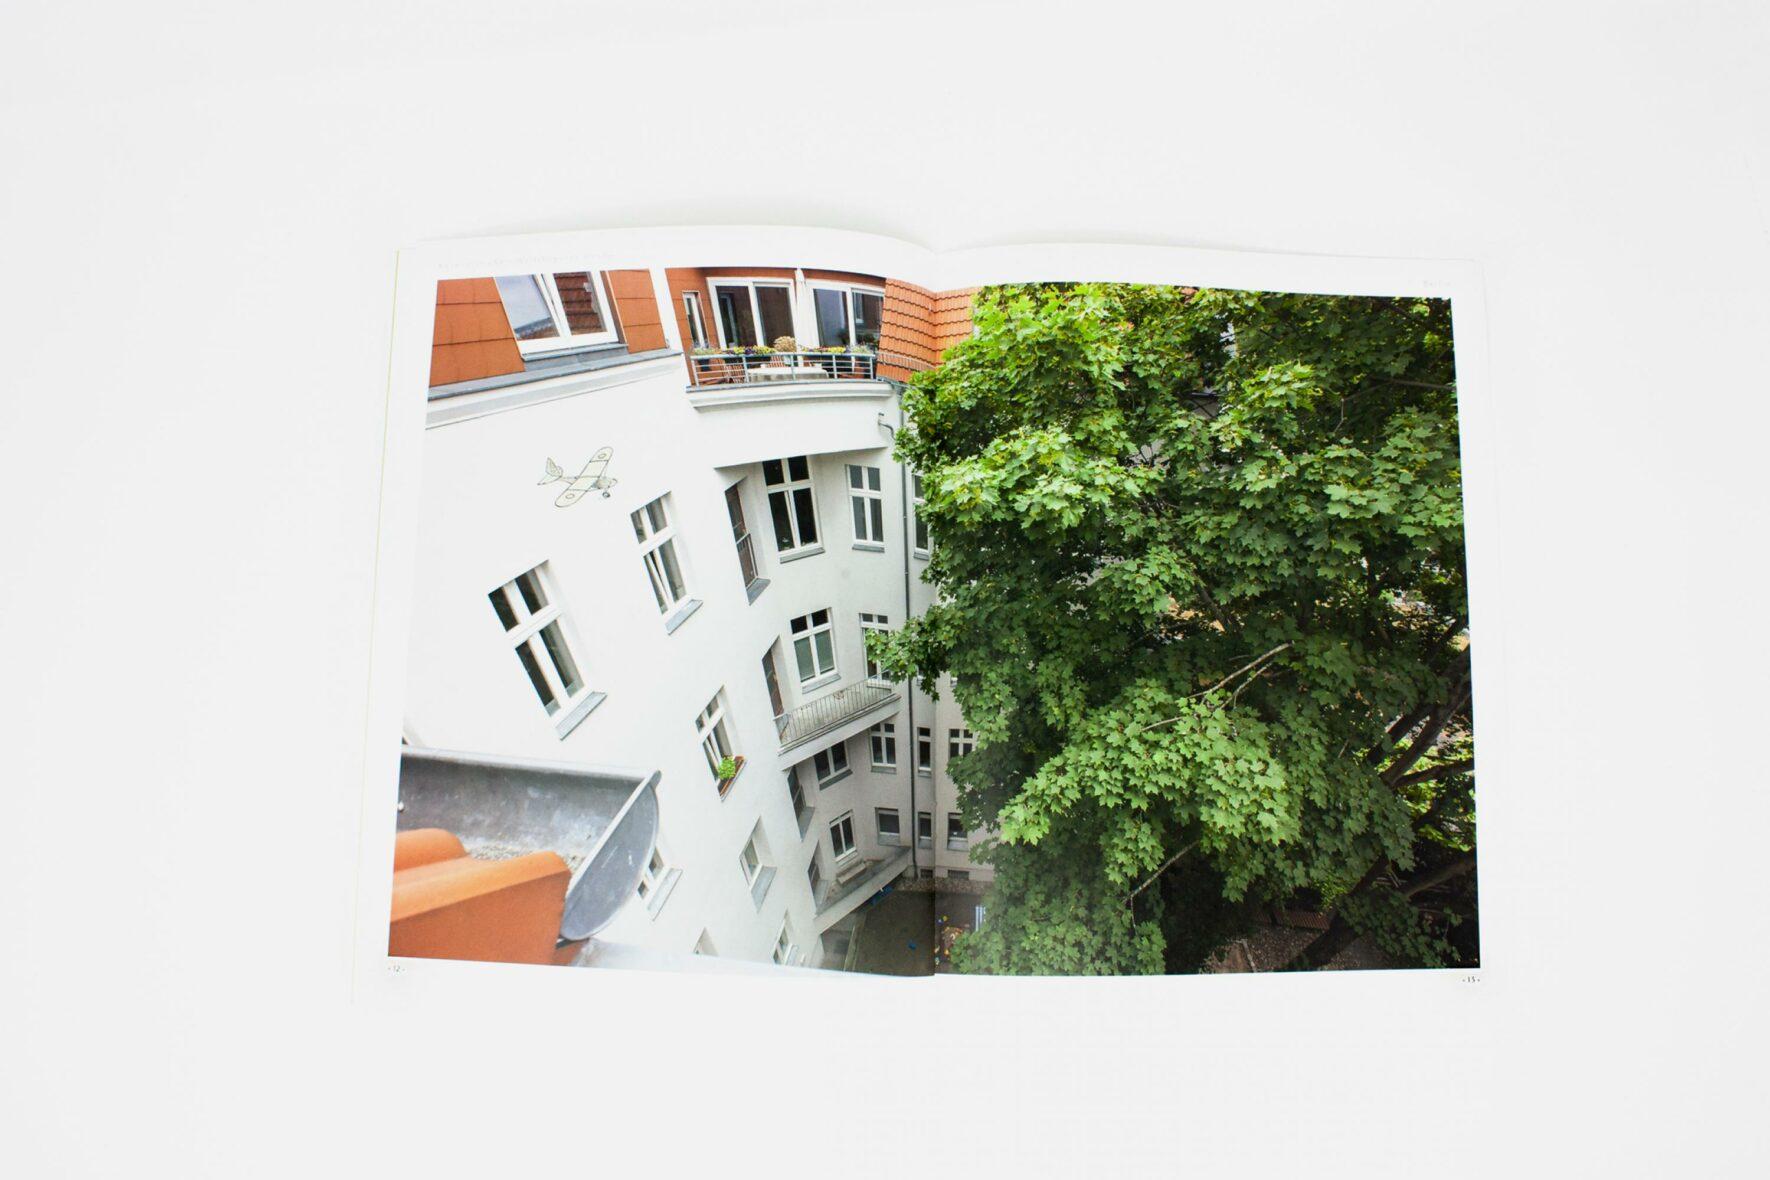 FORMLOS-Trendcity-Immobilien-Corporate-Design-Layout-Broschüre-12